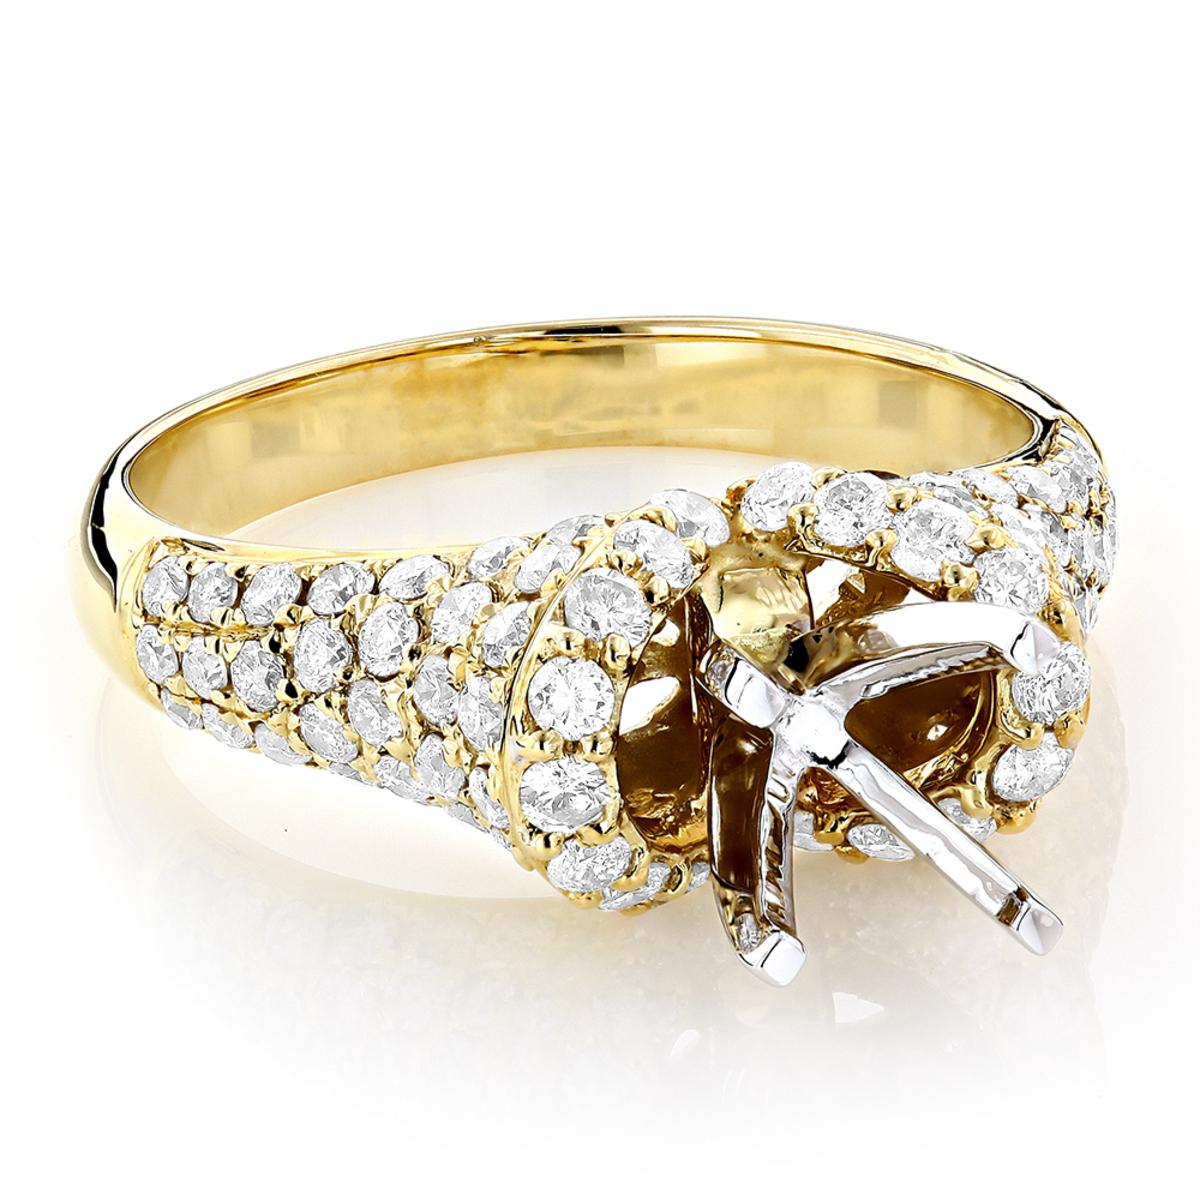 14K Gold Diamond Engagement Ring Setting 1.50ct